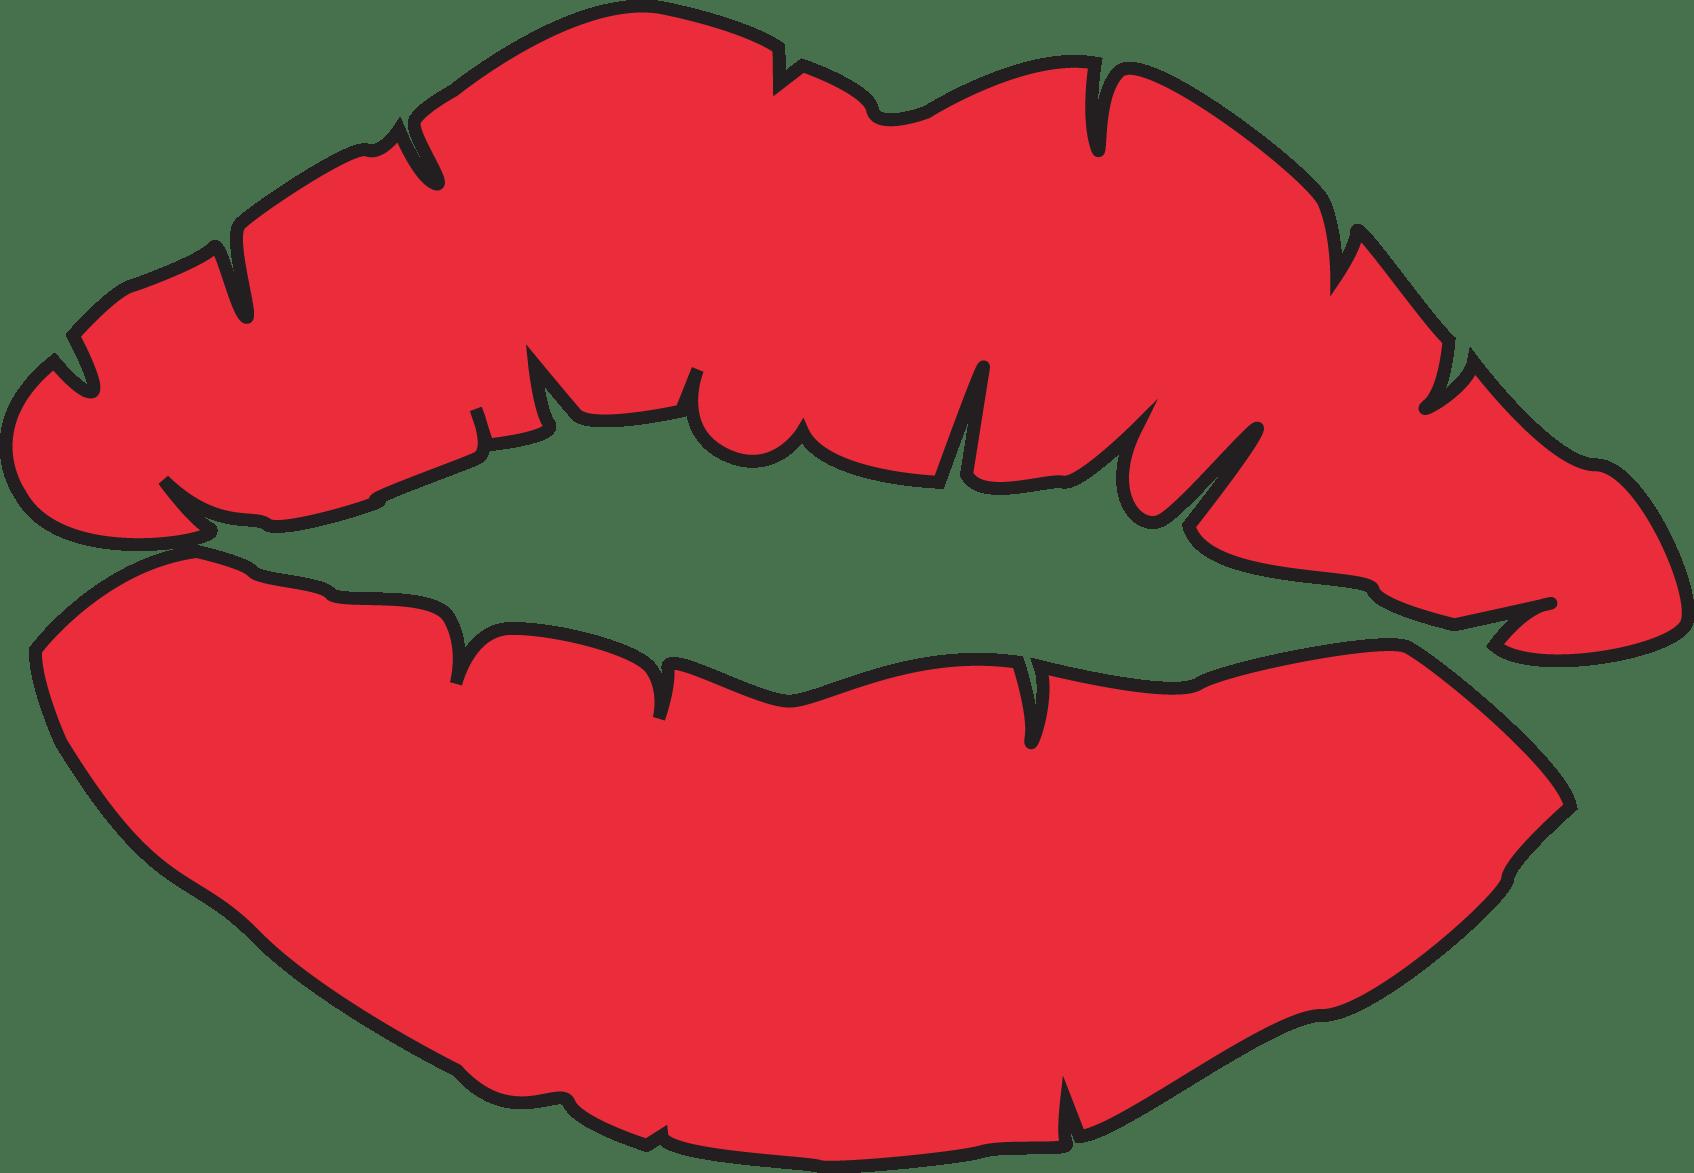 1694x1173 Kiss Lips Clip Art Free Hairsstyles.co